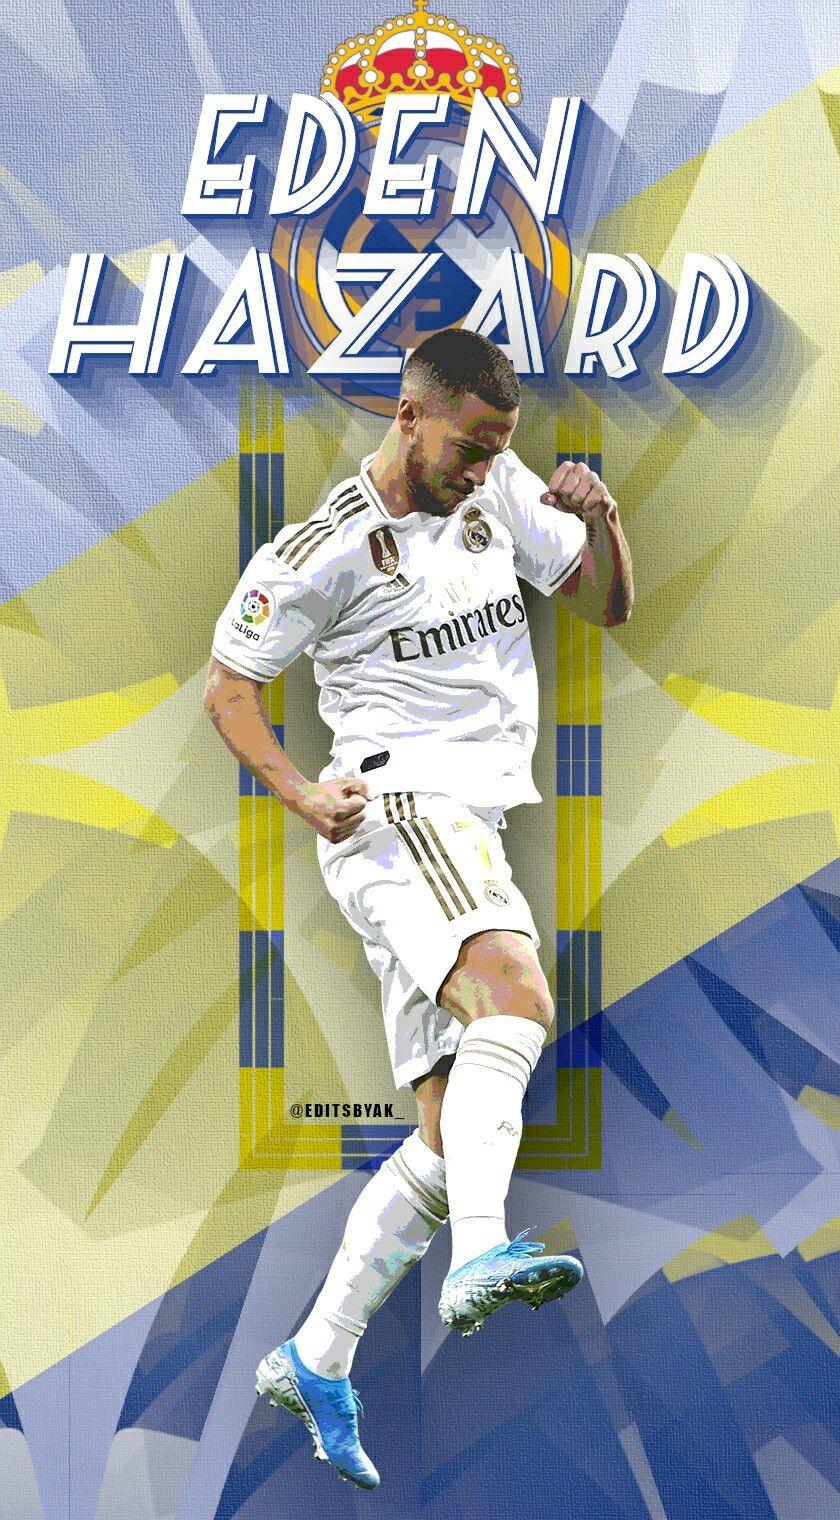 Eden Hazard Real Madrid Wallpaper In 2020 Real Madrid Wallpapers Hazard Real Madrid Madrid Wallpaper